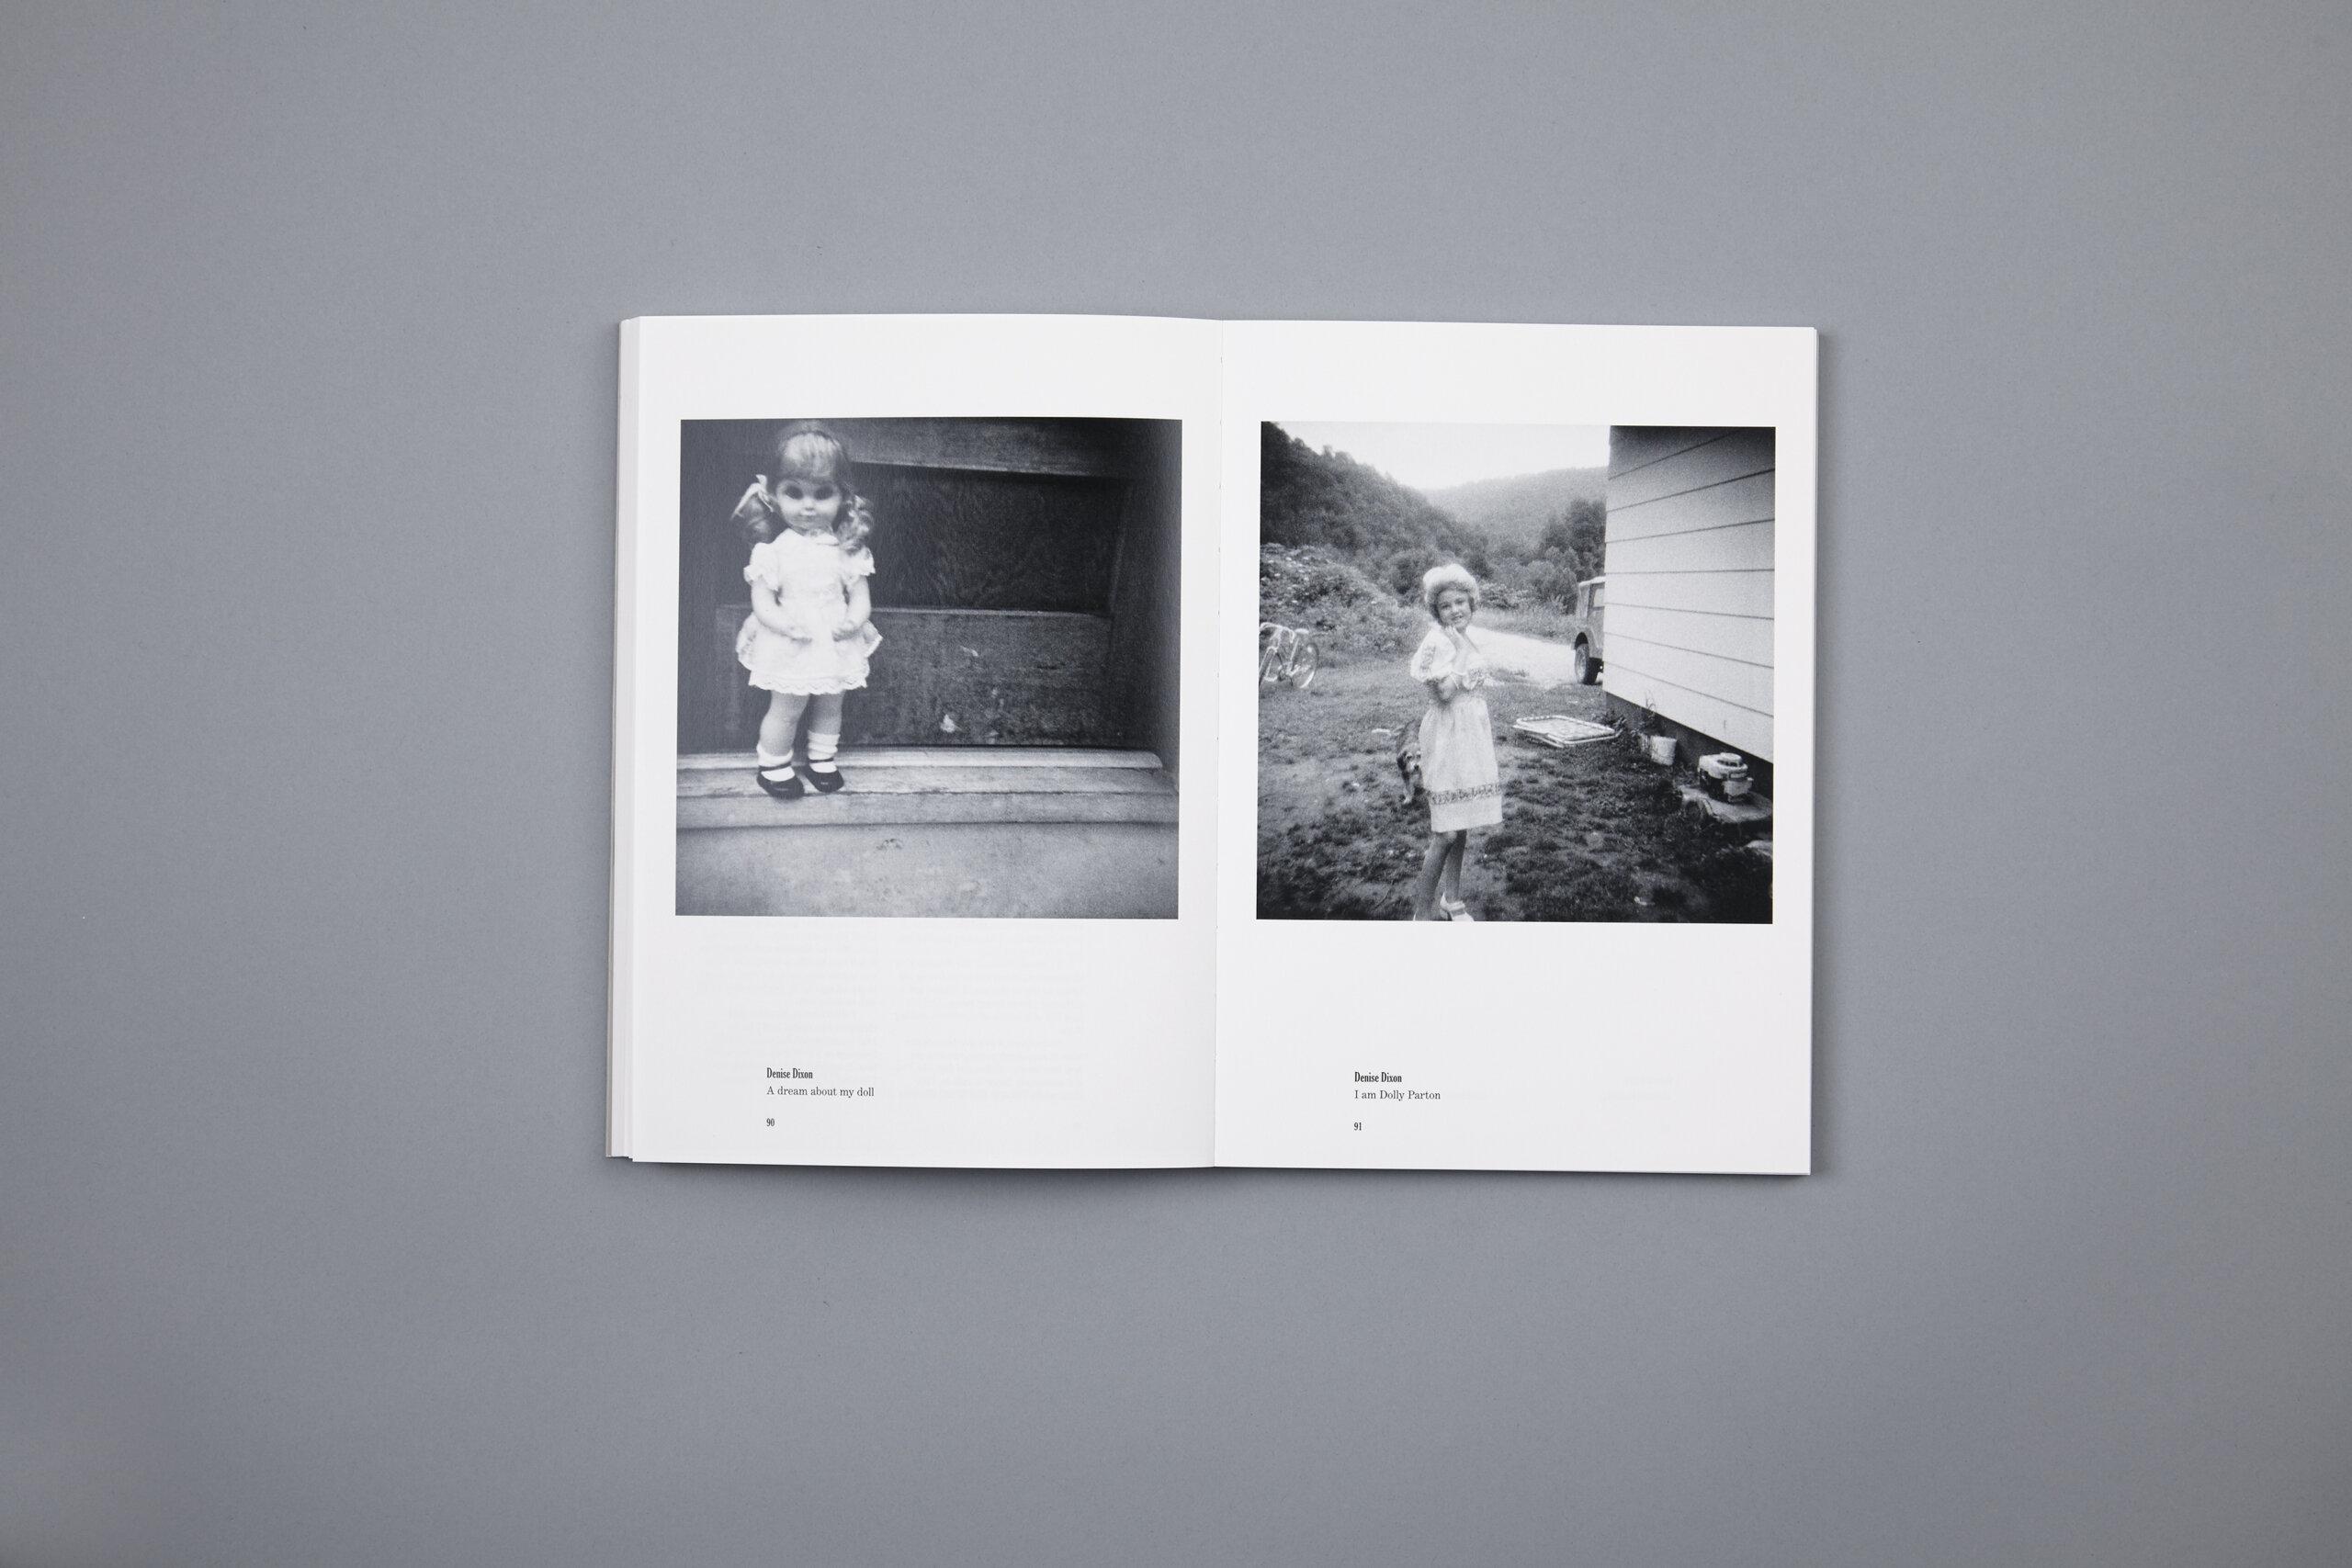 ewald-portraits-and-dreams-delpire-co-5